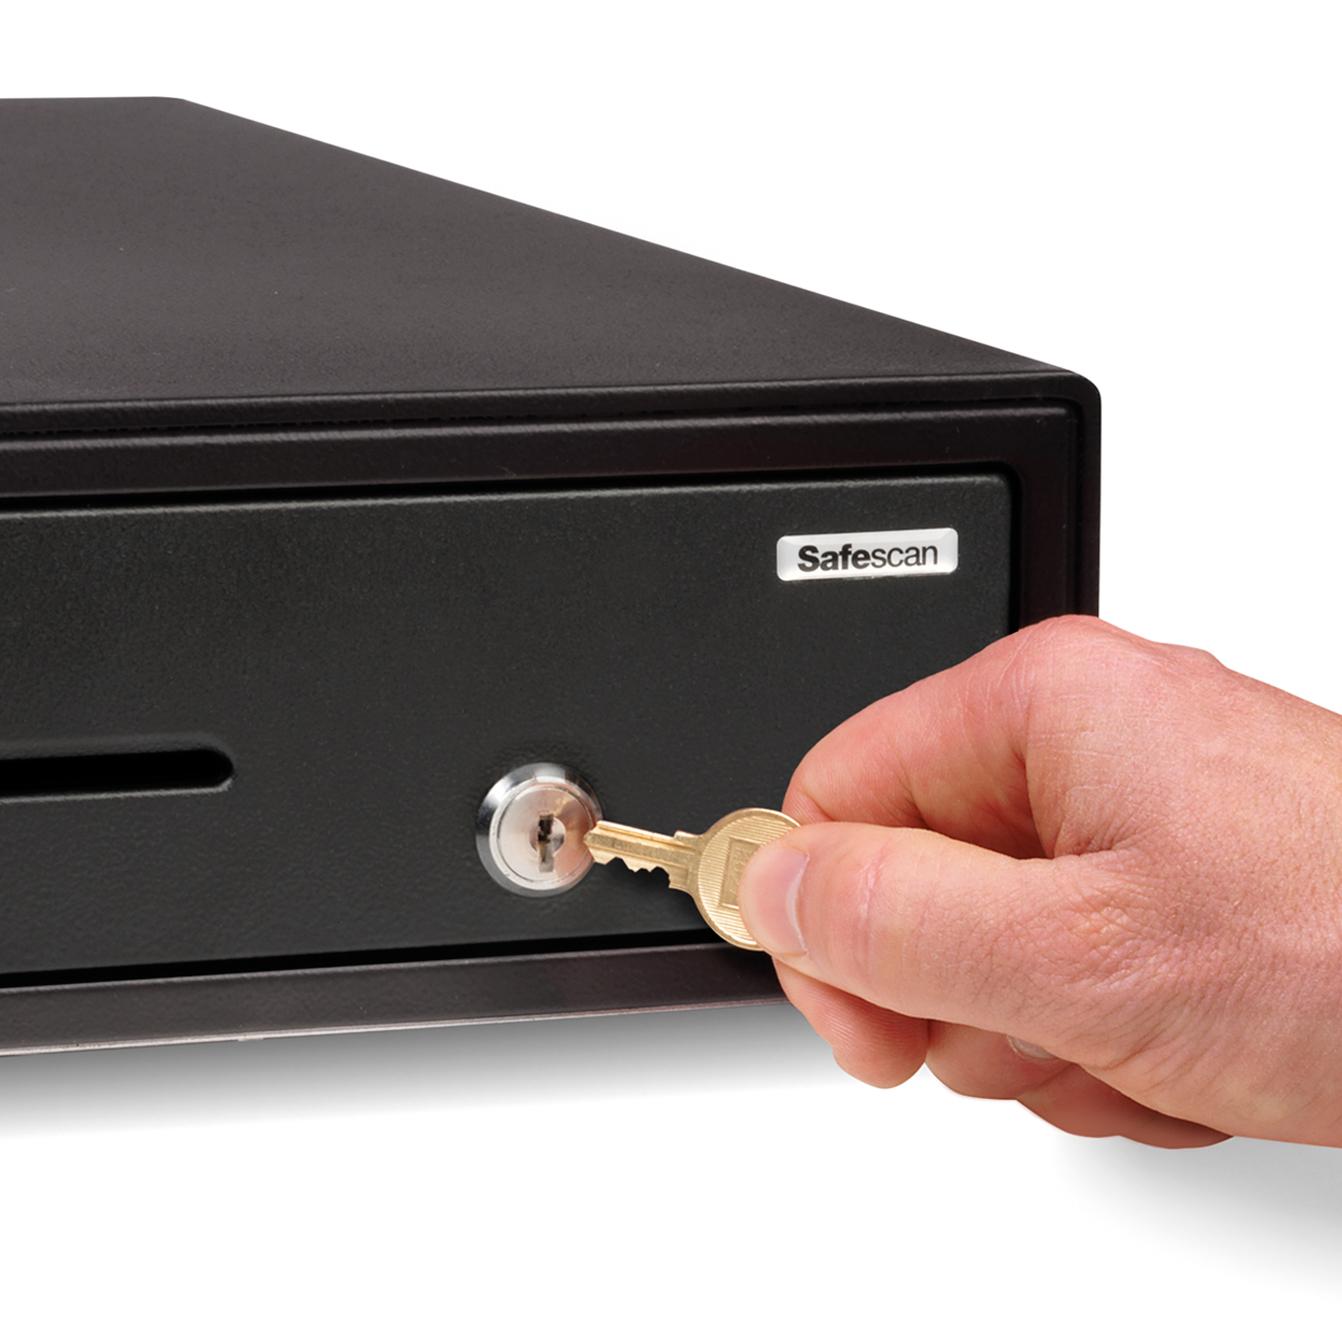 Safescan SD-4141 Cash Drawer Standard Use 6.6kg L410xW415xH115mm Black Ref 132-0425